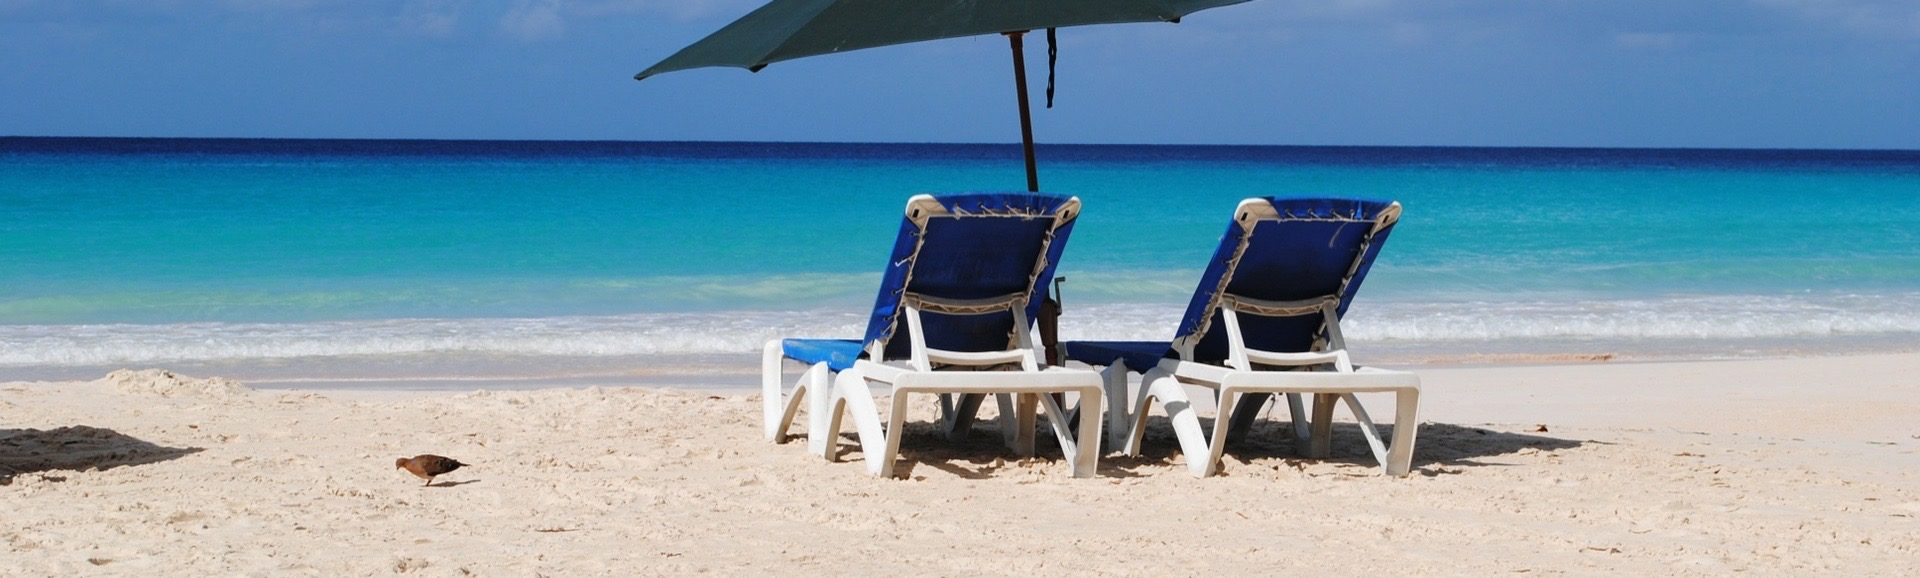 Barbados stränder